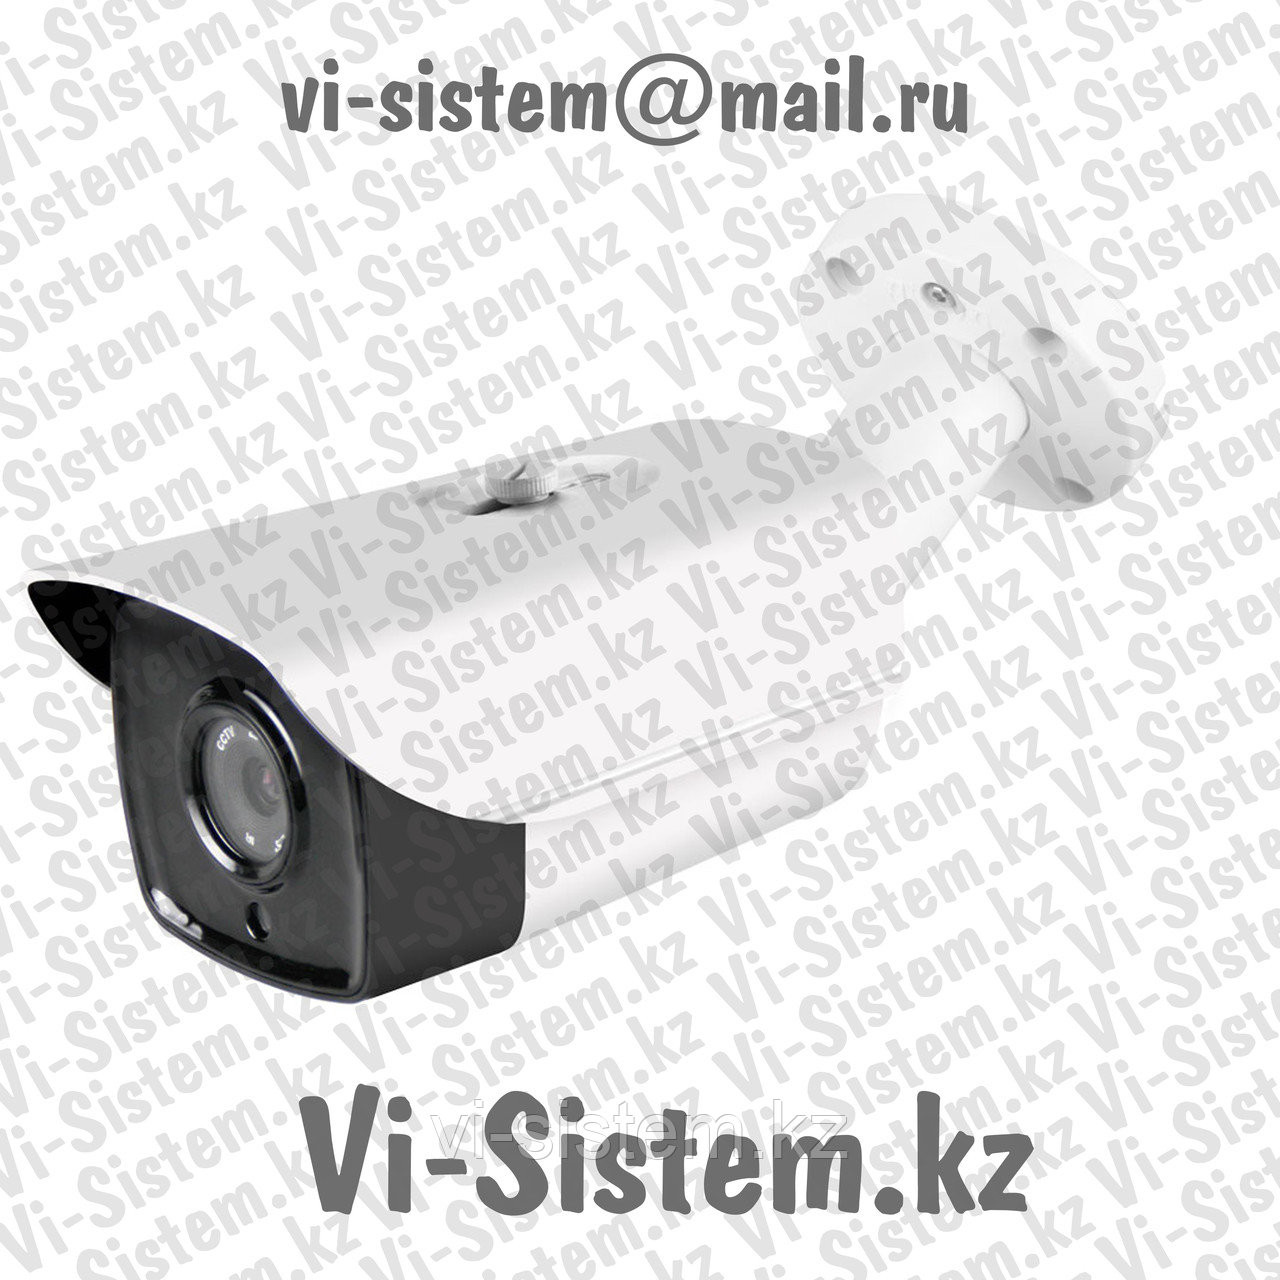 IP-Видеокамера SYNQAR 270 POE 2MP